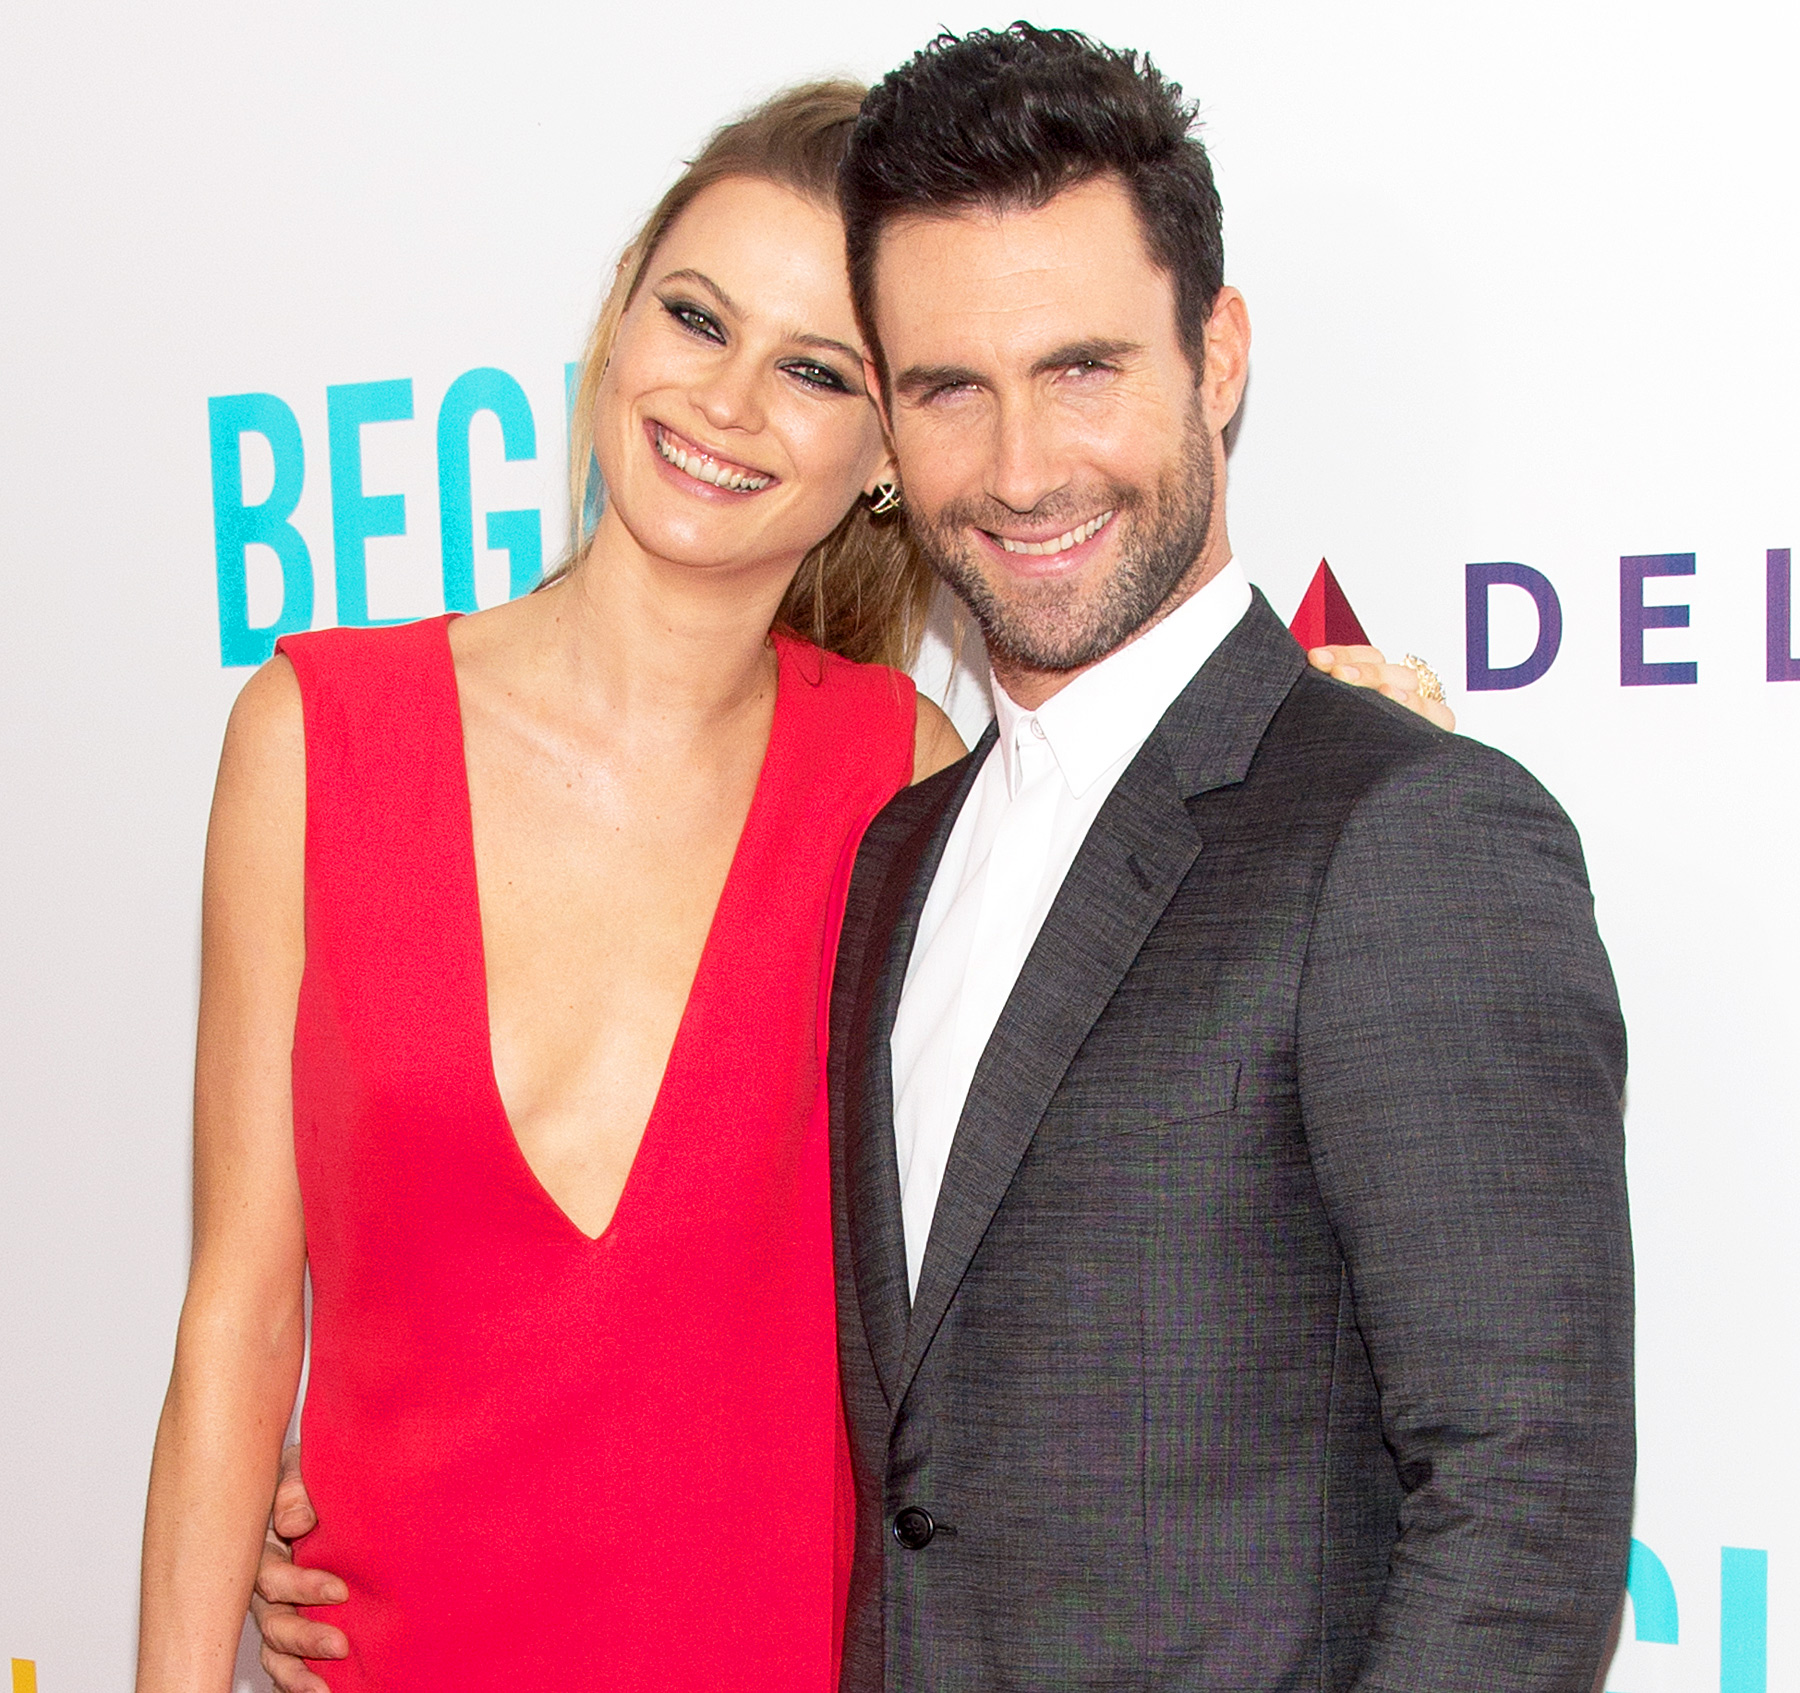 Adam Married with Behati Prinsloo